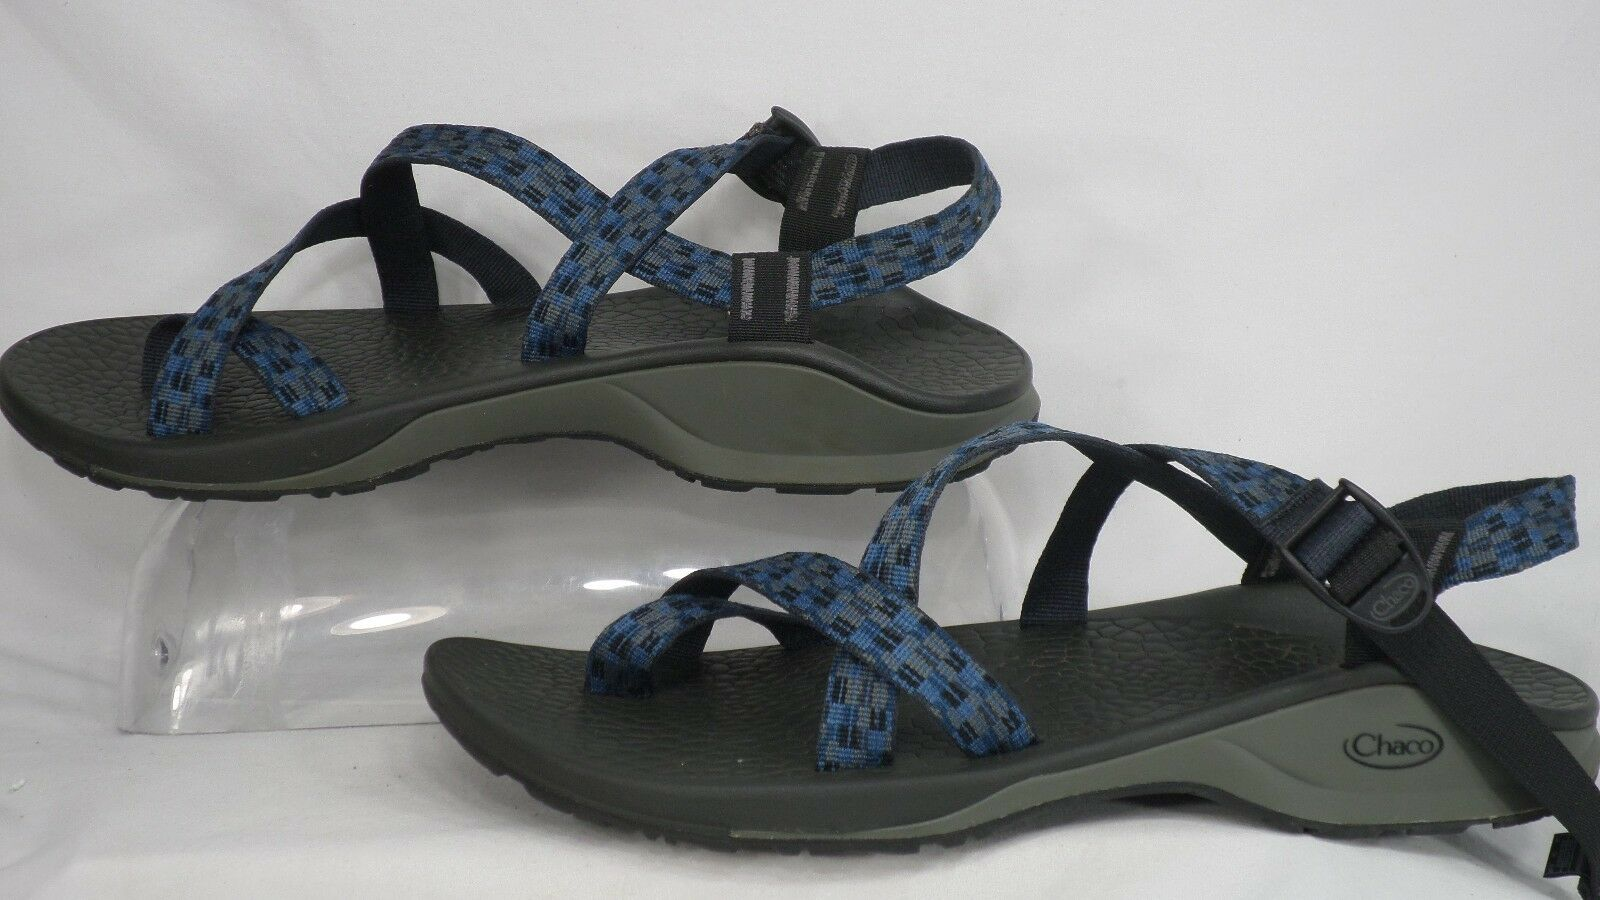 Chaco Men's J104723 'Updraft Ecotread Ecotread Ecotread 2' Cube color Sport Sandal Men Size 15 M 05b7c3